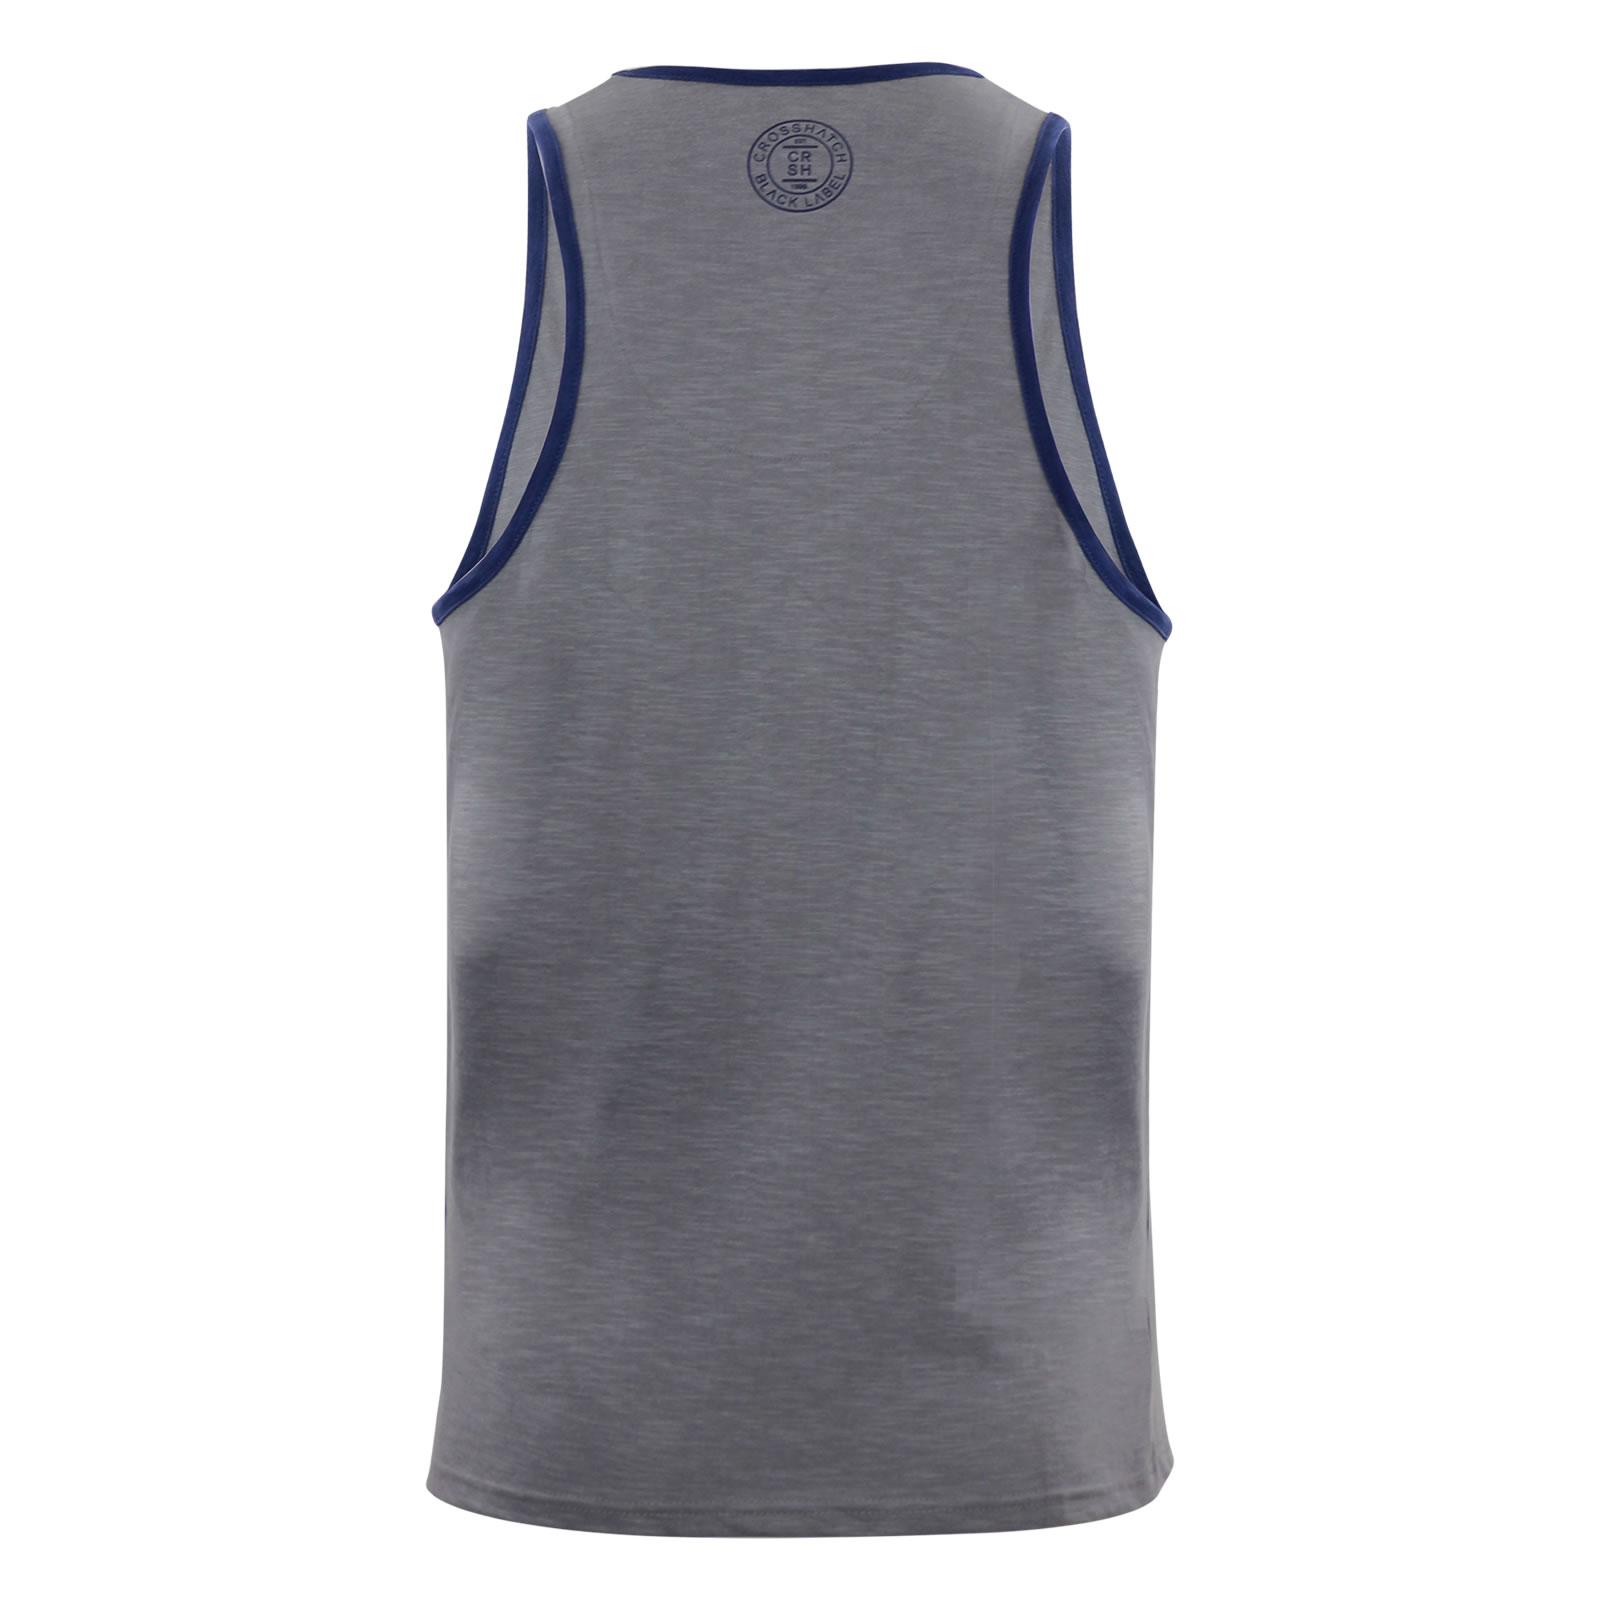 miniature 12 - Homme-debardeur-t-shirt-crosshatch-alfa-summer-muscle-back-tank-top